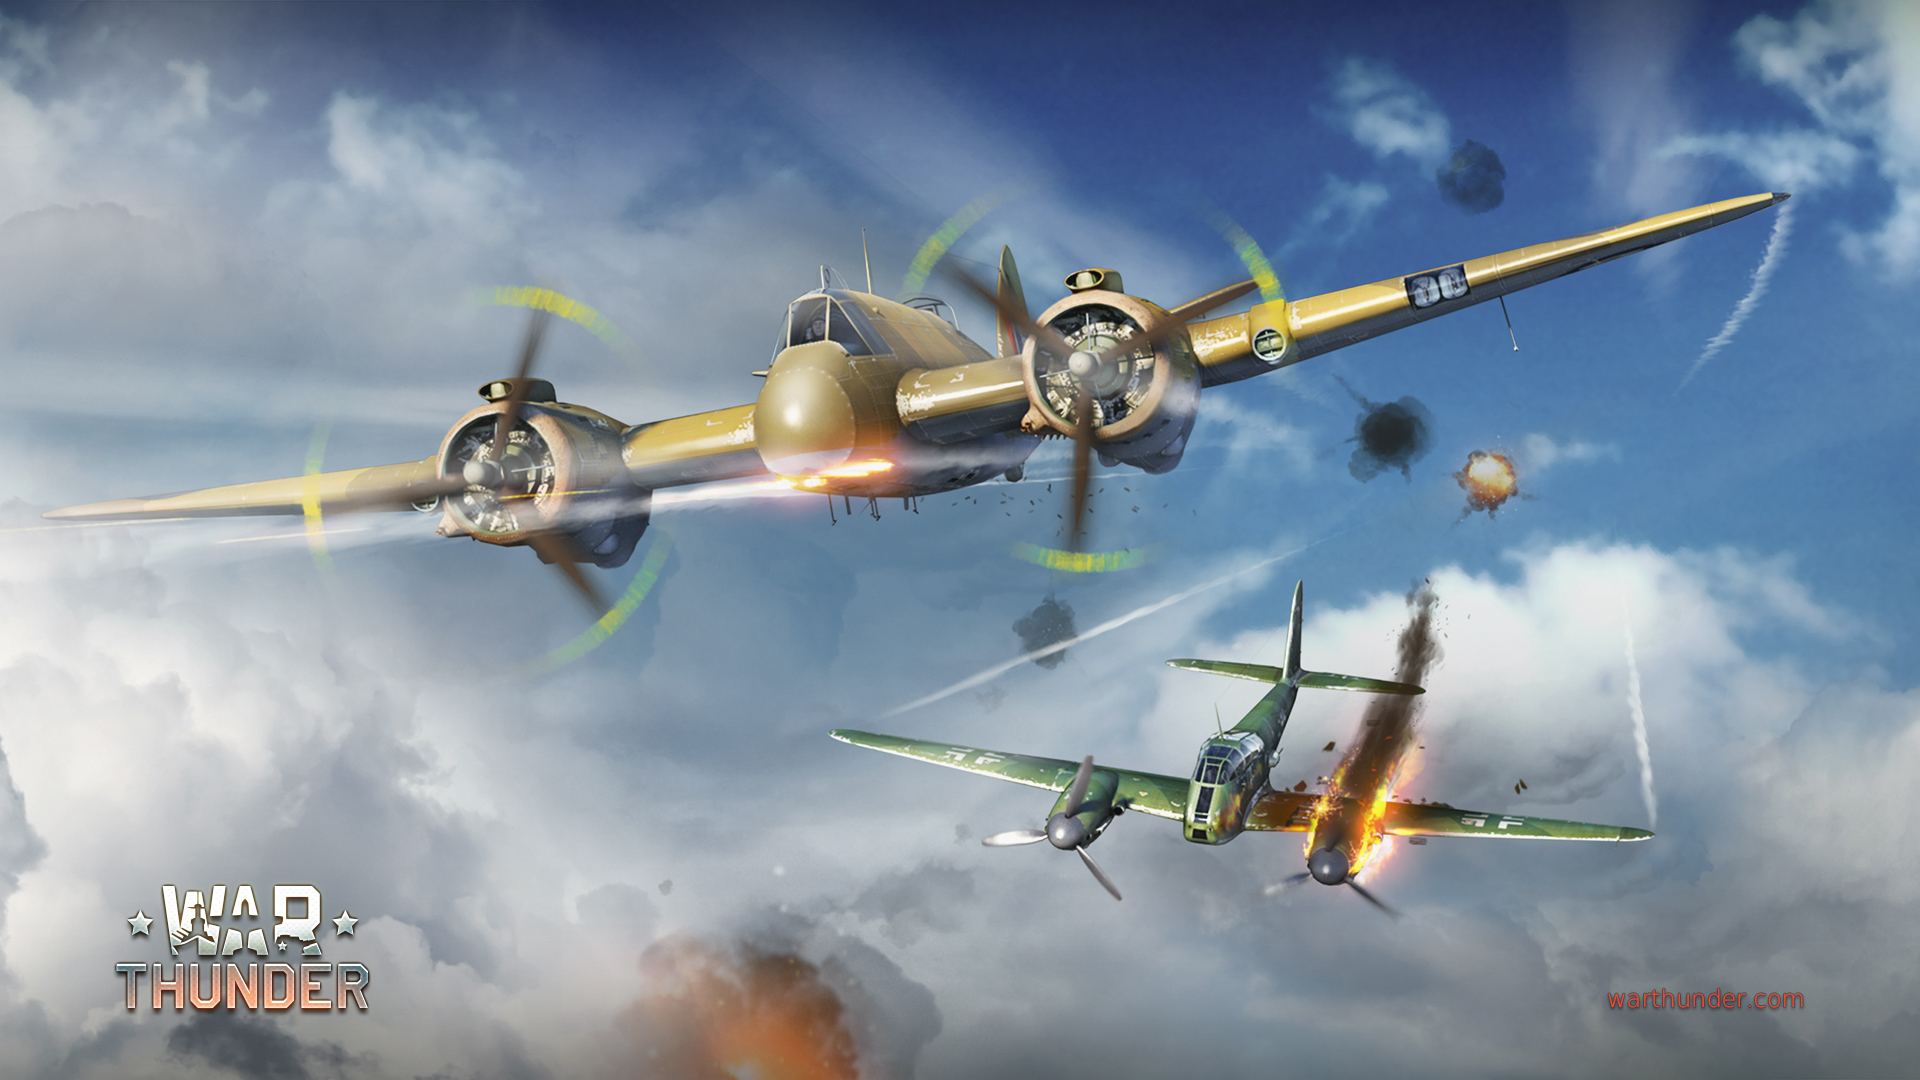 Обои war, Airplane, painting, attacker, aviation, bomber, Douglas A-1 Skyraider. Авиация foto 8